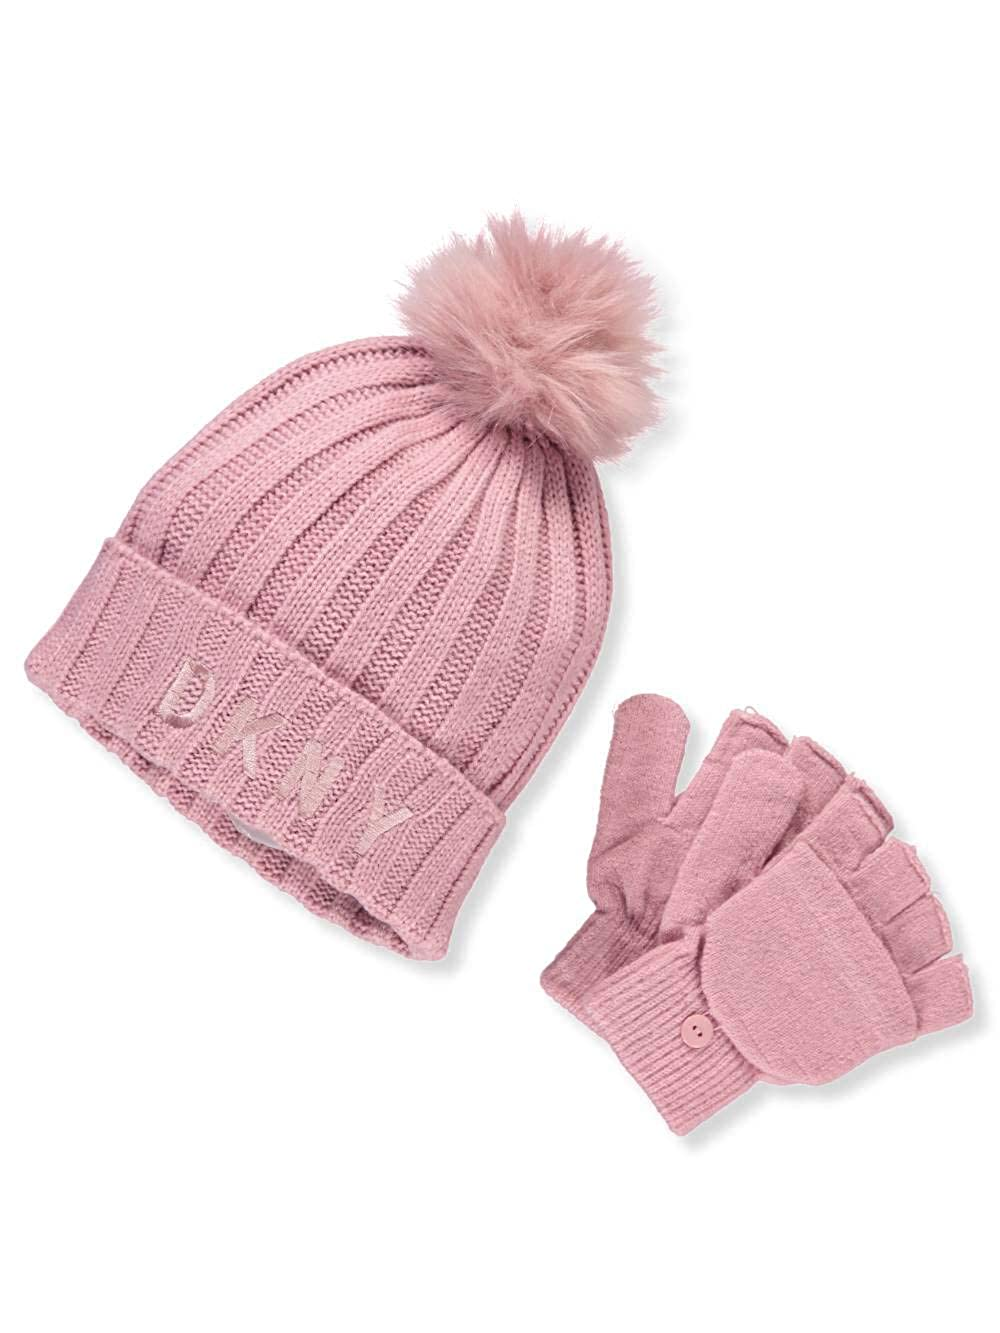 28c66c125 DKNY Girls' Knit Beanie & Gloves Set - Pink, 7-16: Amazon.co.uk ...